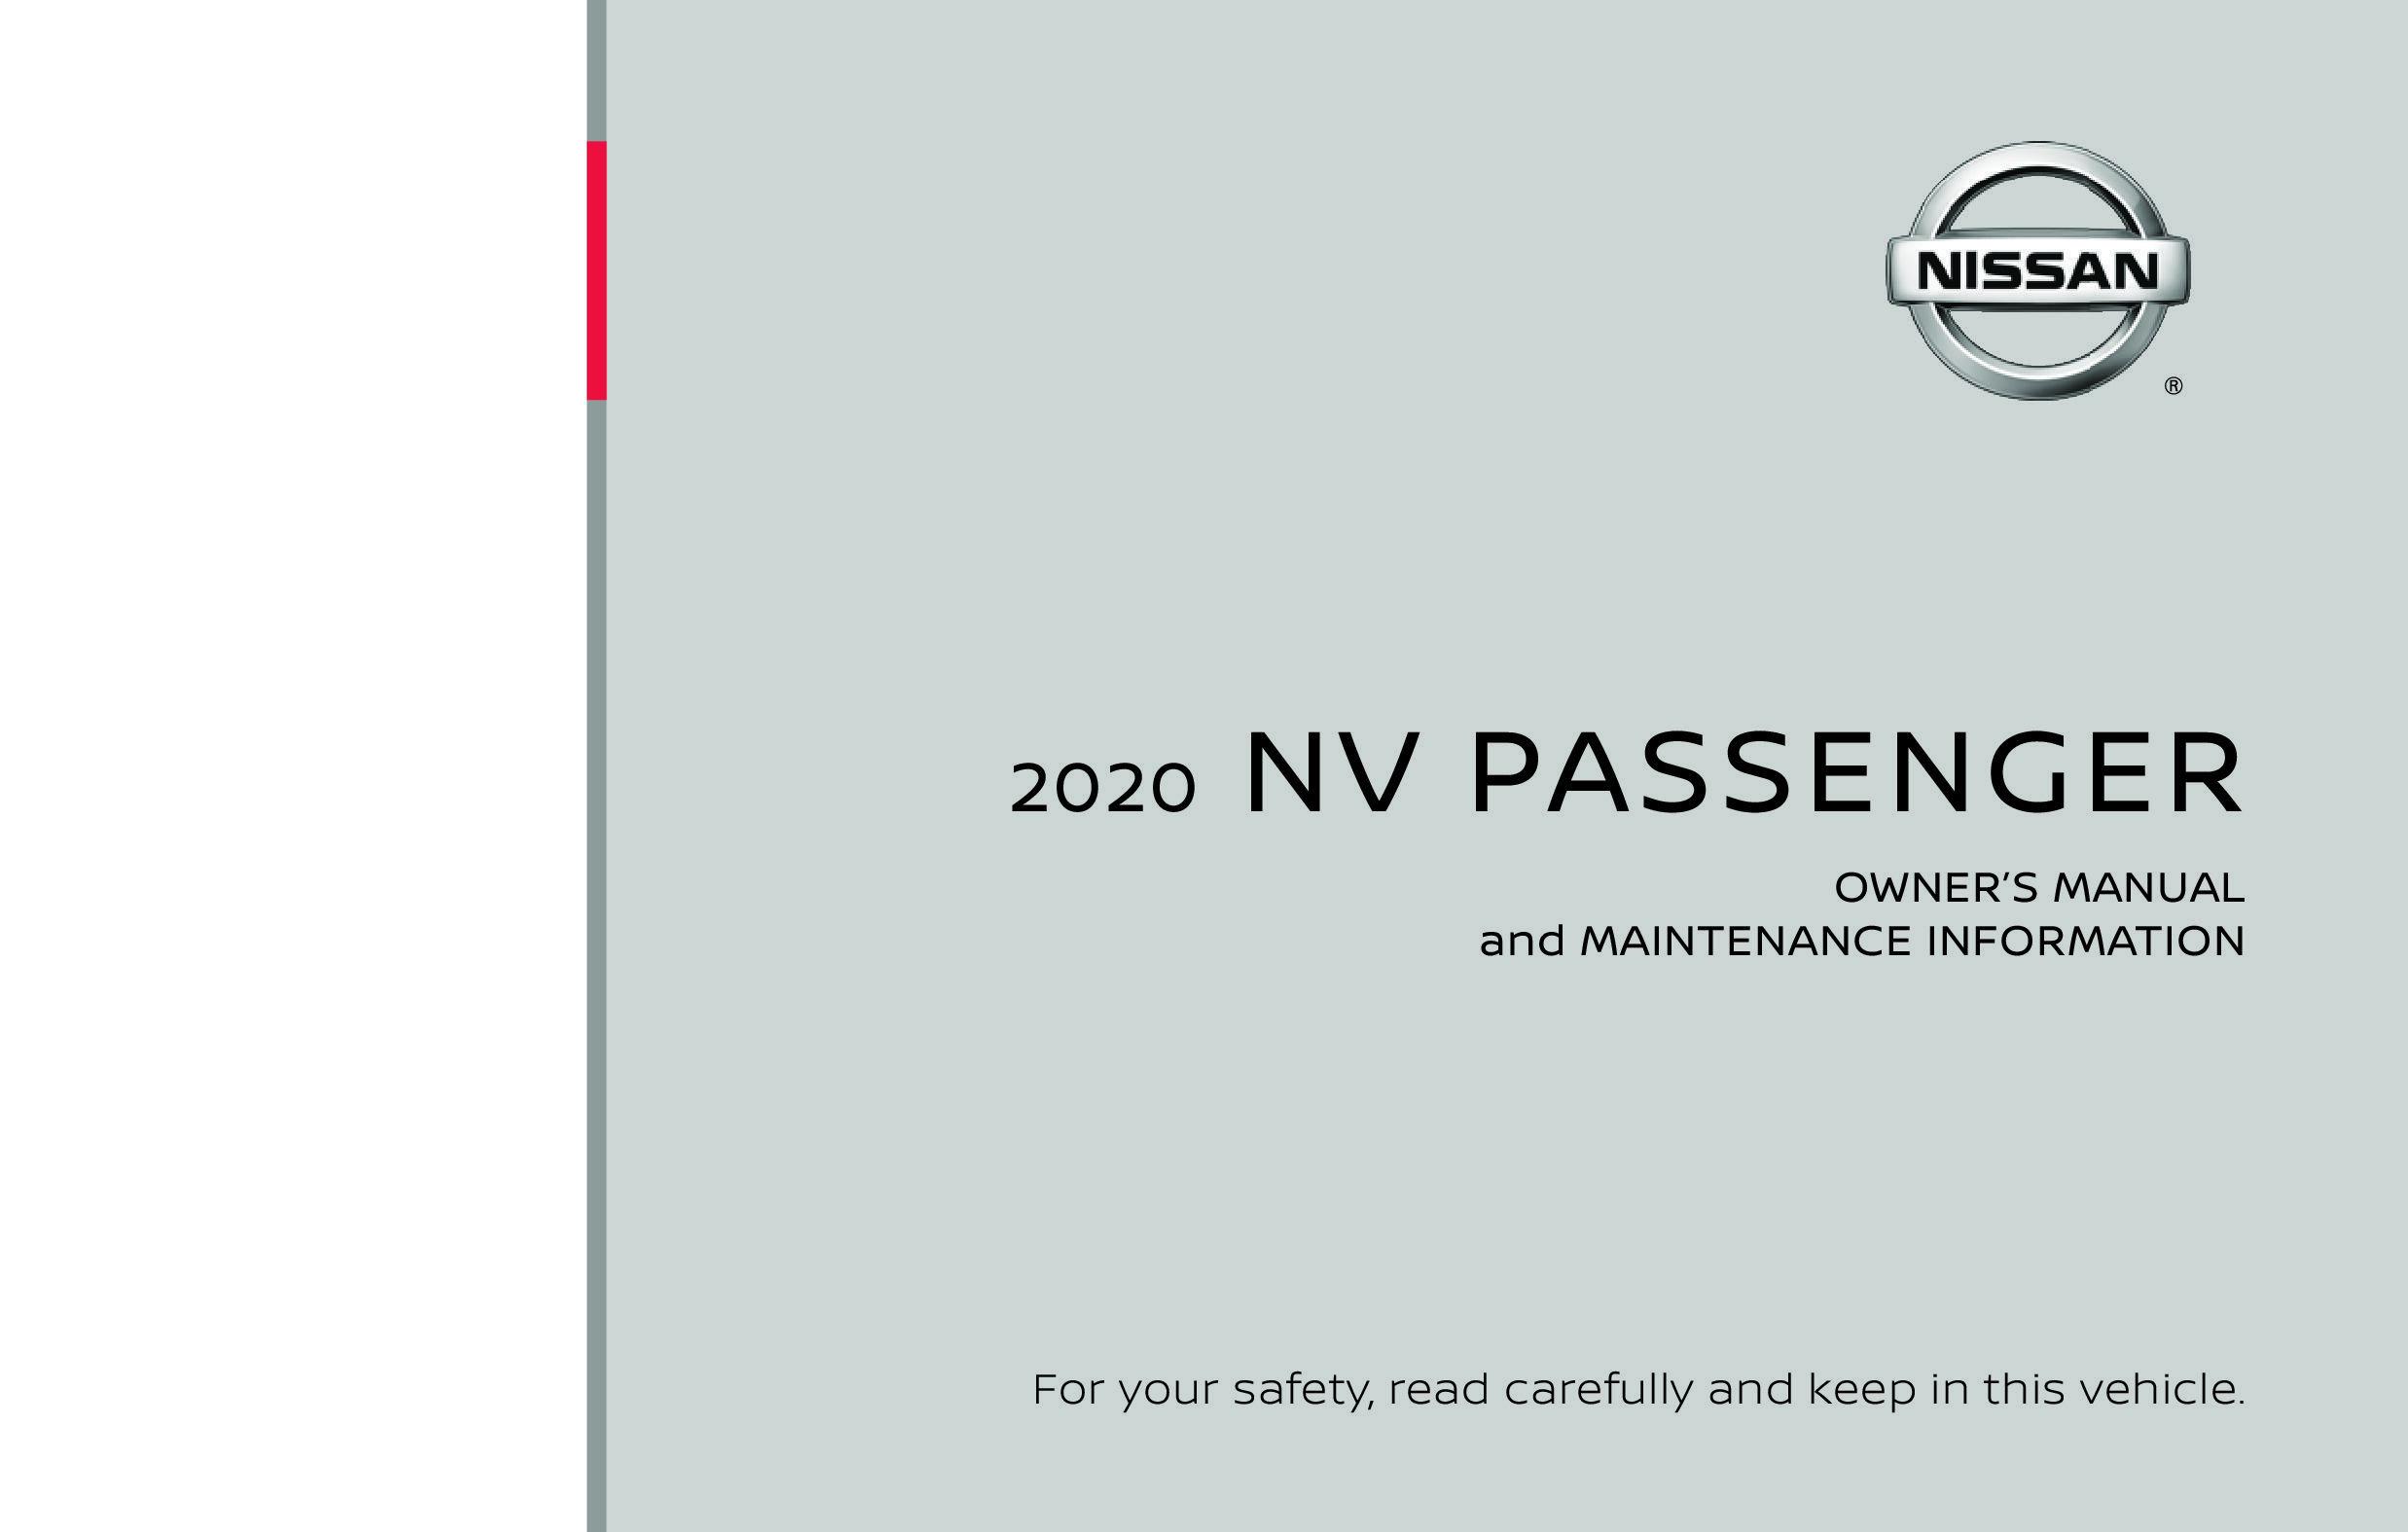 2020 Nissan Nv Passenger owners manual